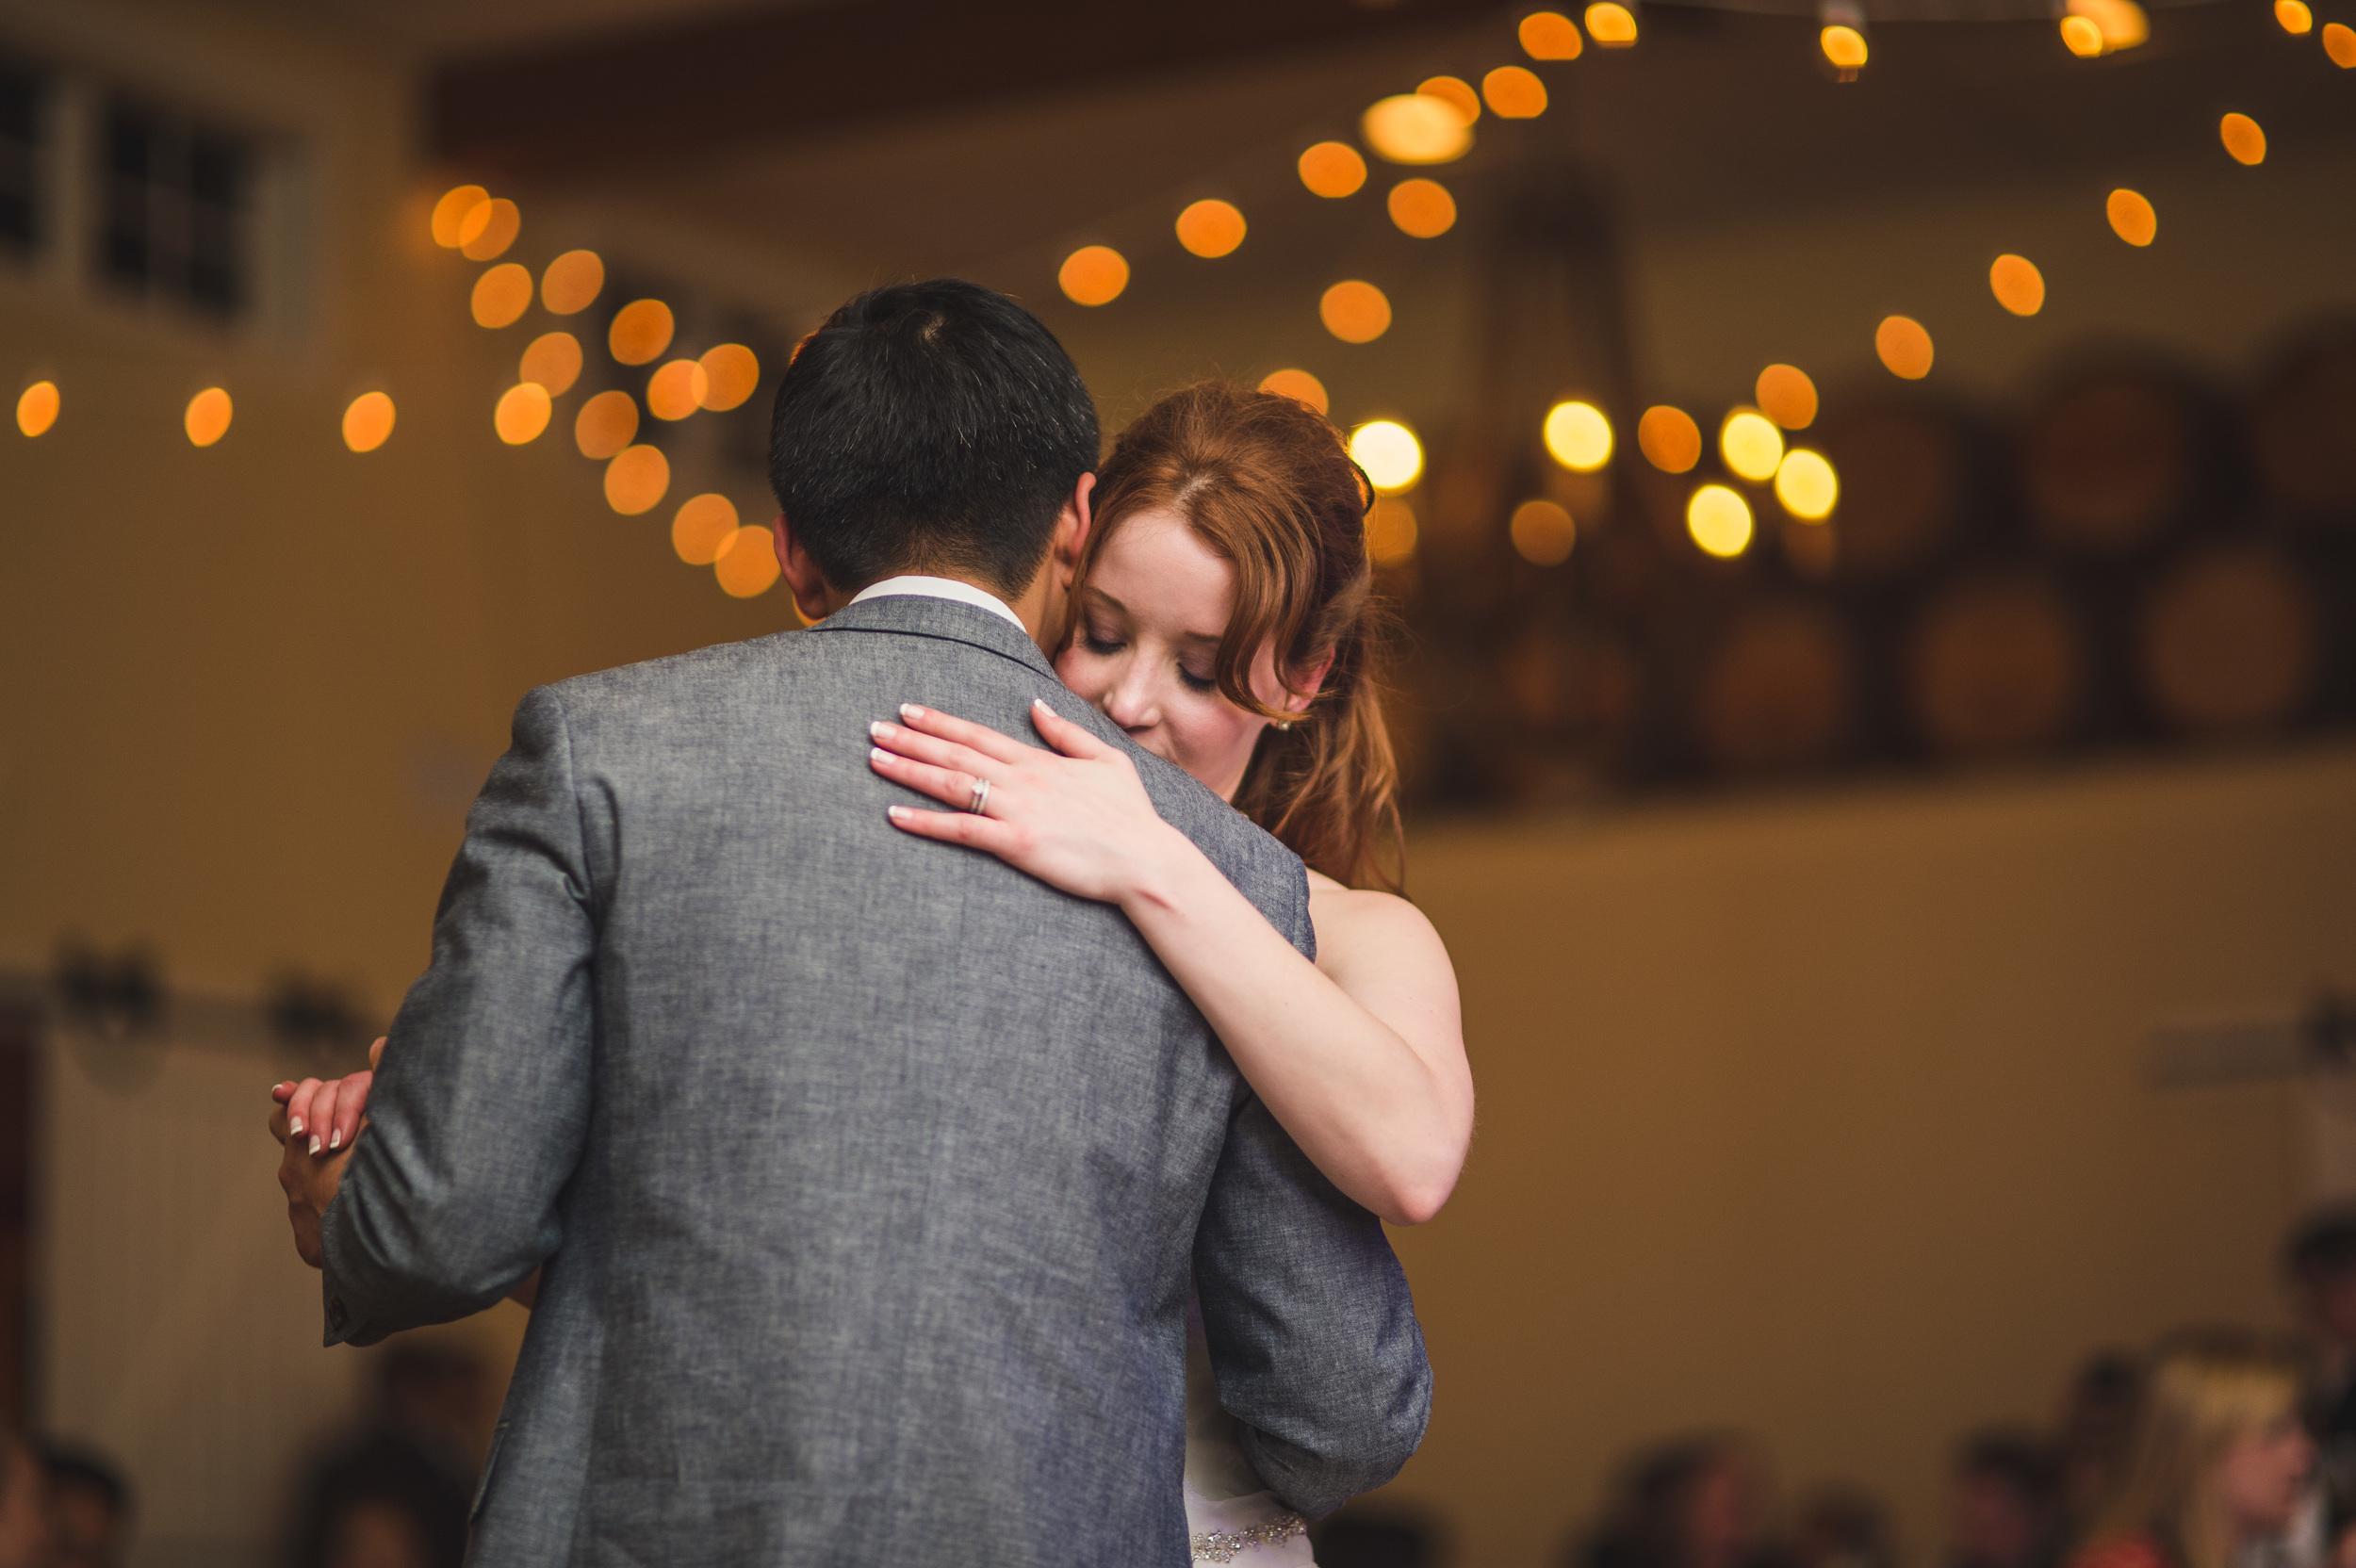 Photojournalistic wedding photography Baltimore MD By Mantas Kubilinskas-53.jpg